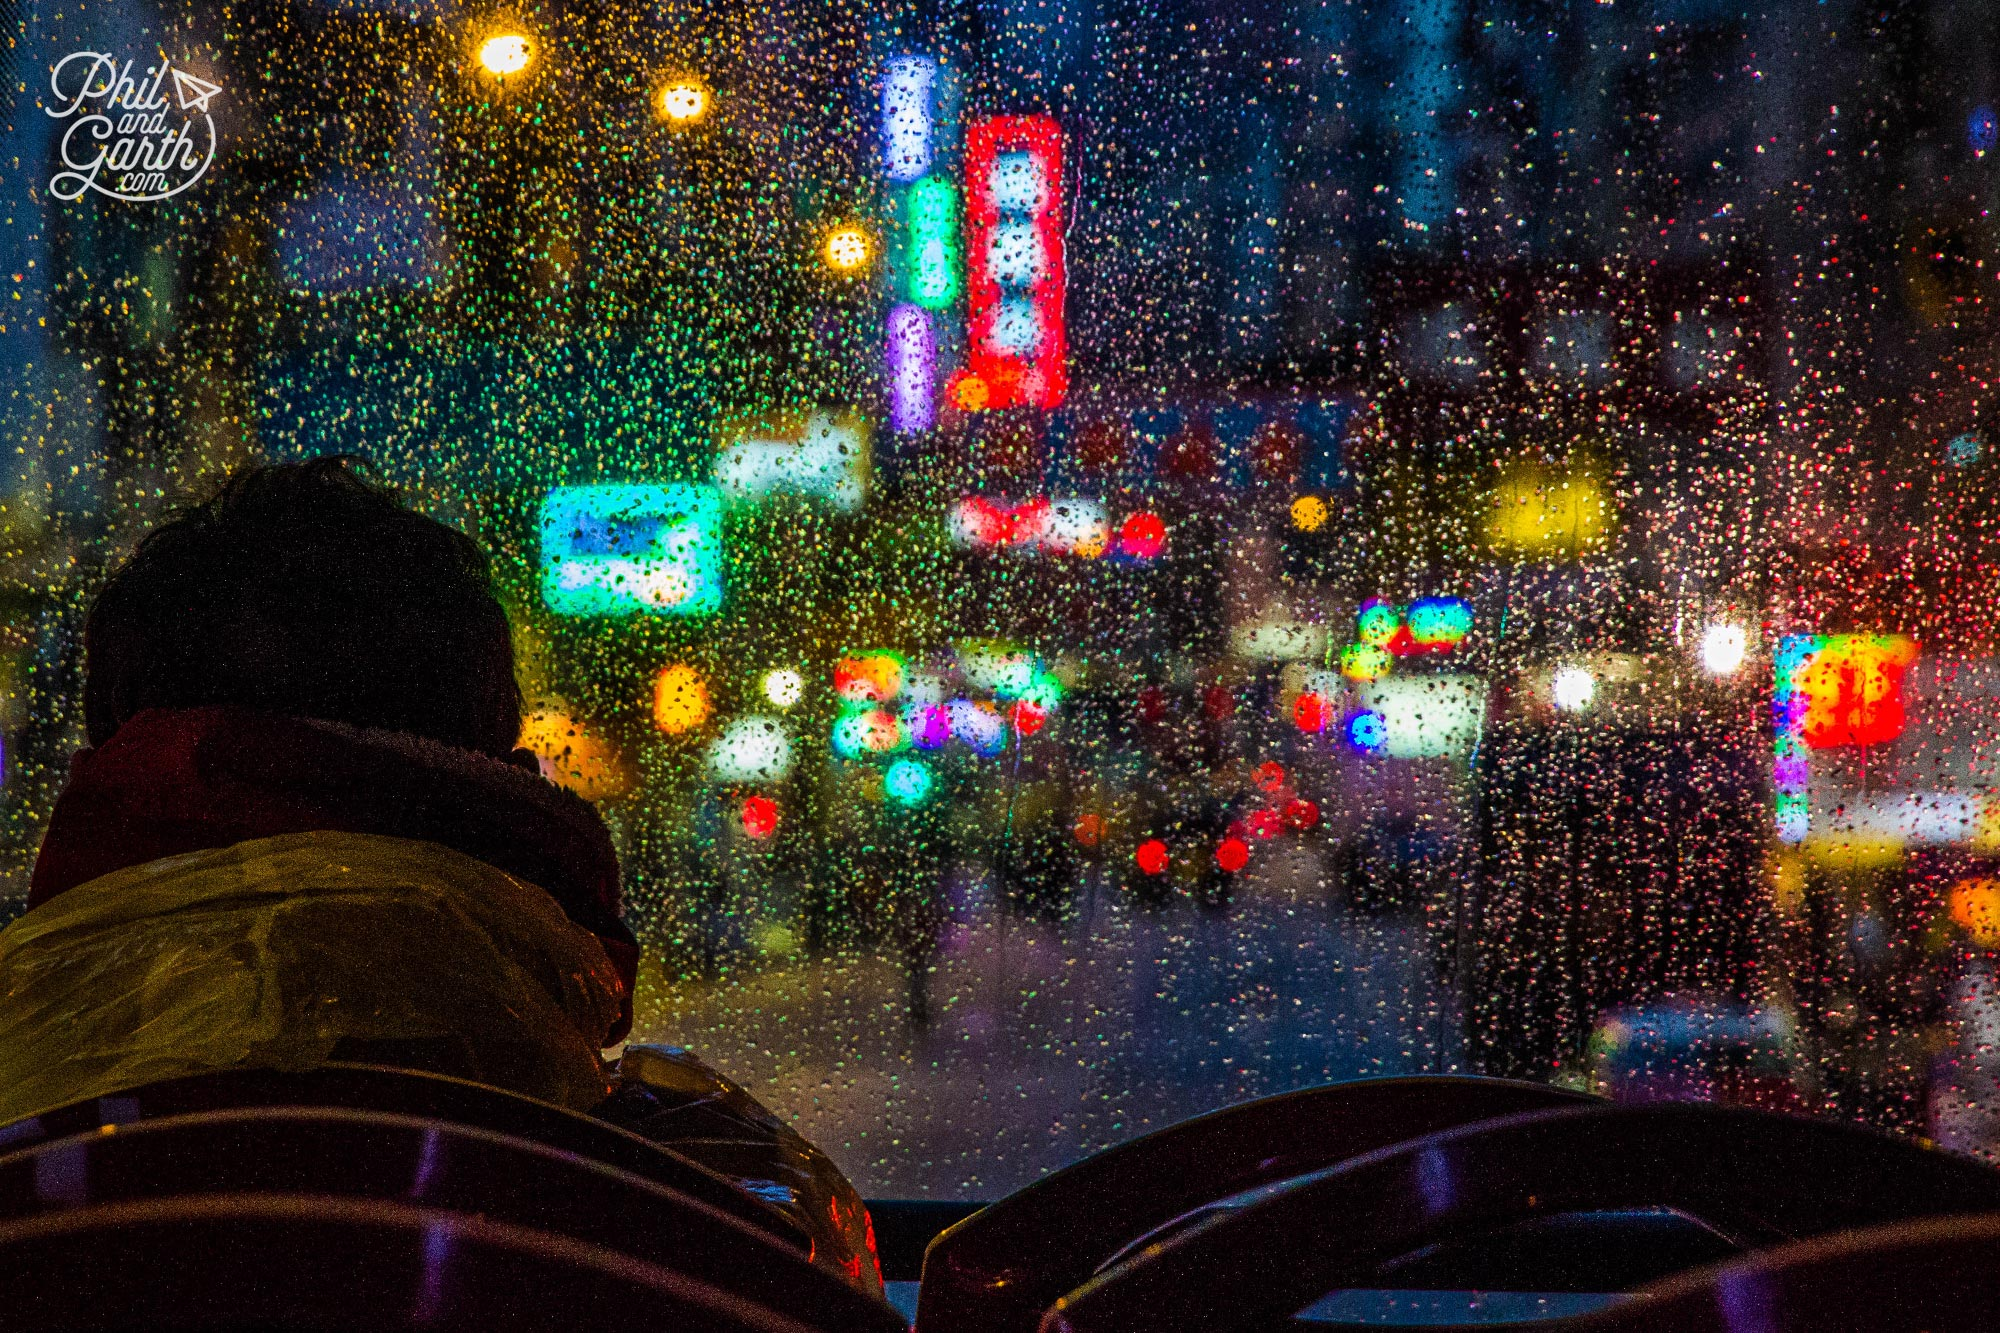 One of our favourite photos taken on the-bus driving through Kowloon